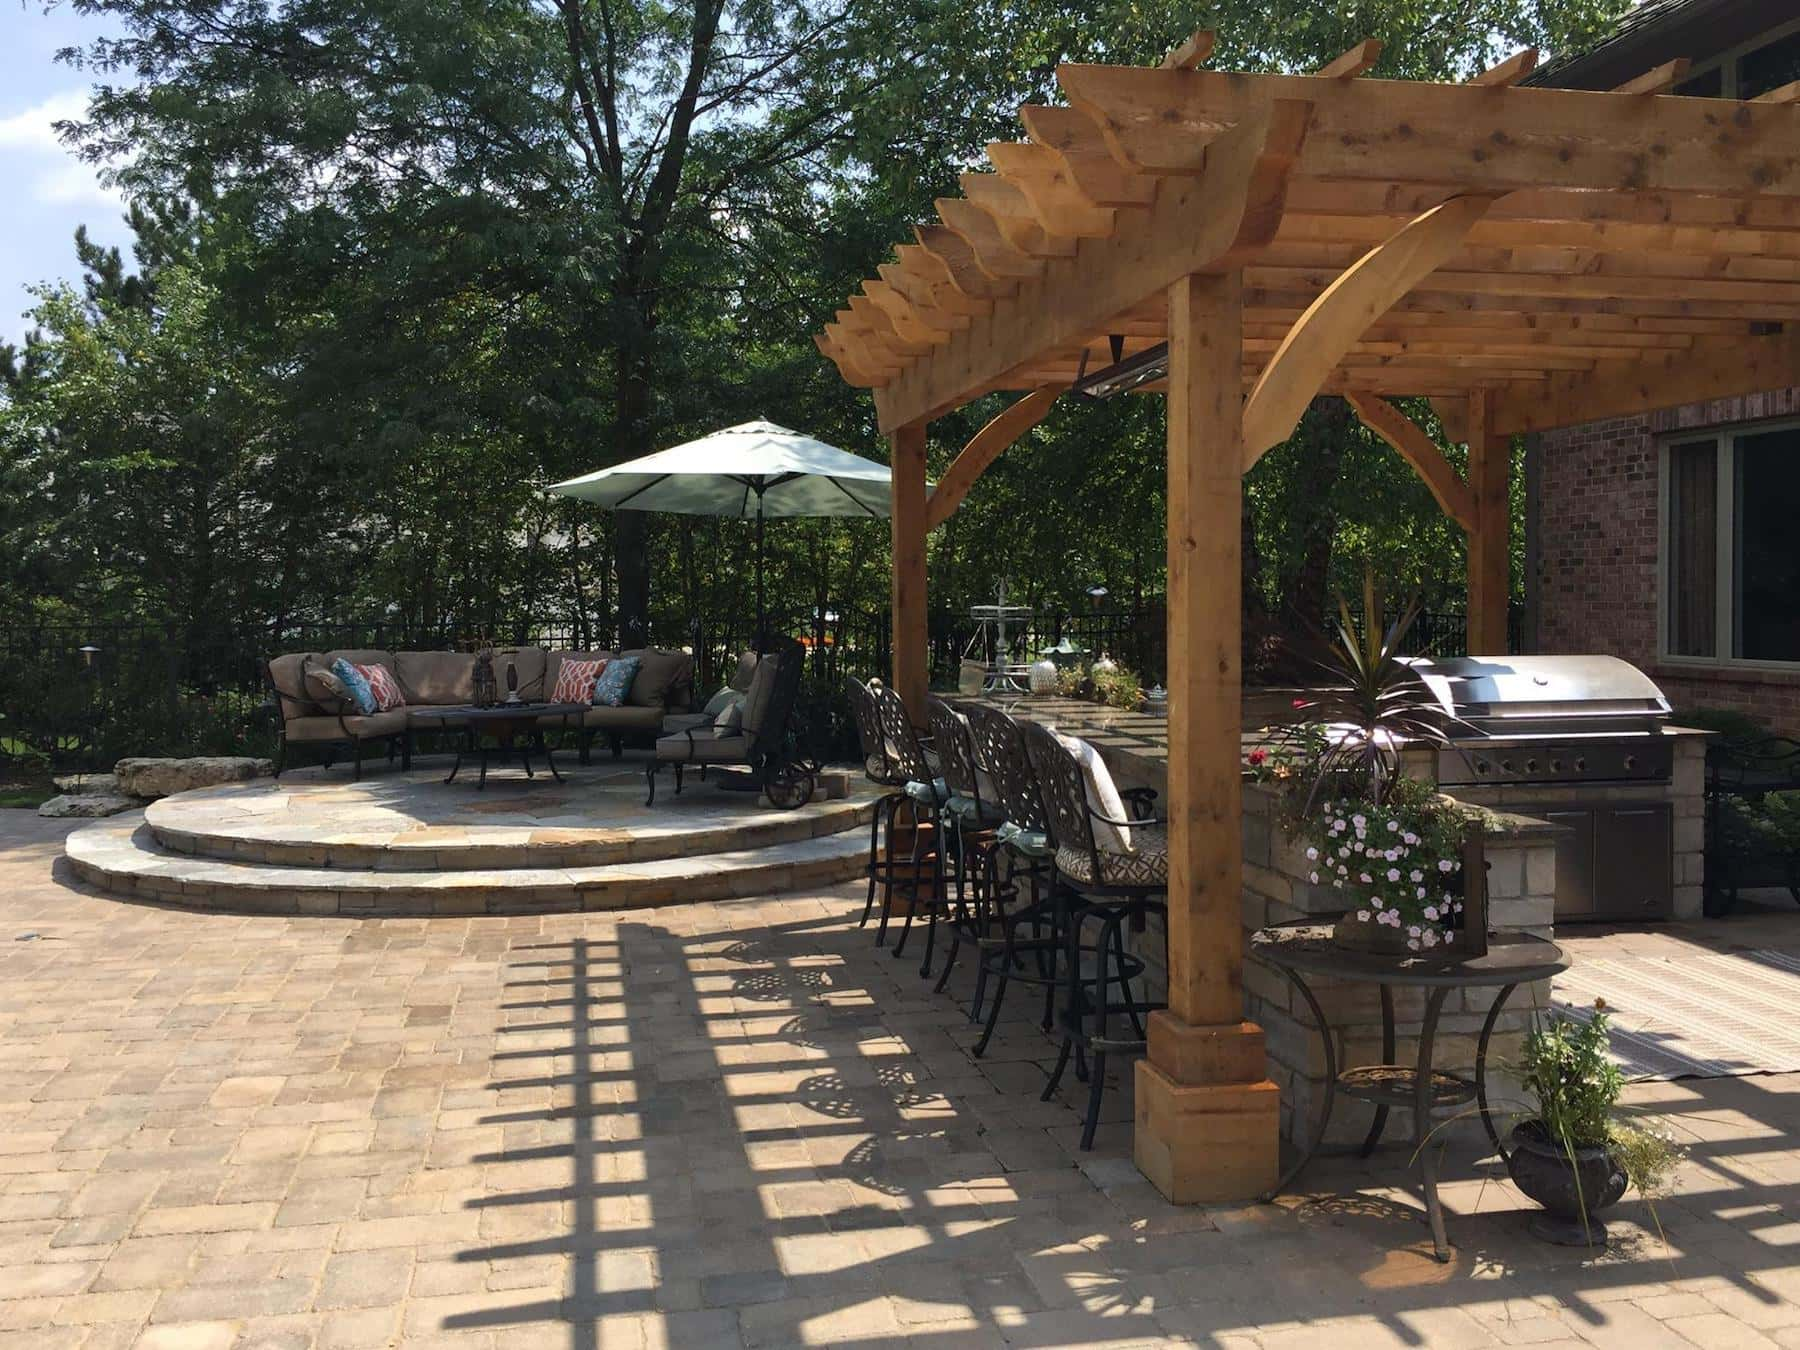 Pergola Paver Patio Outdoor Kitchen Green Oaks IL